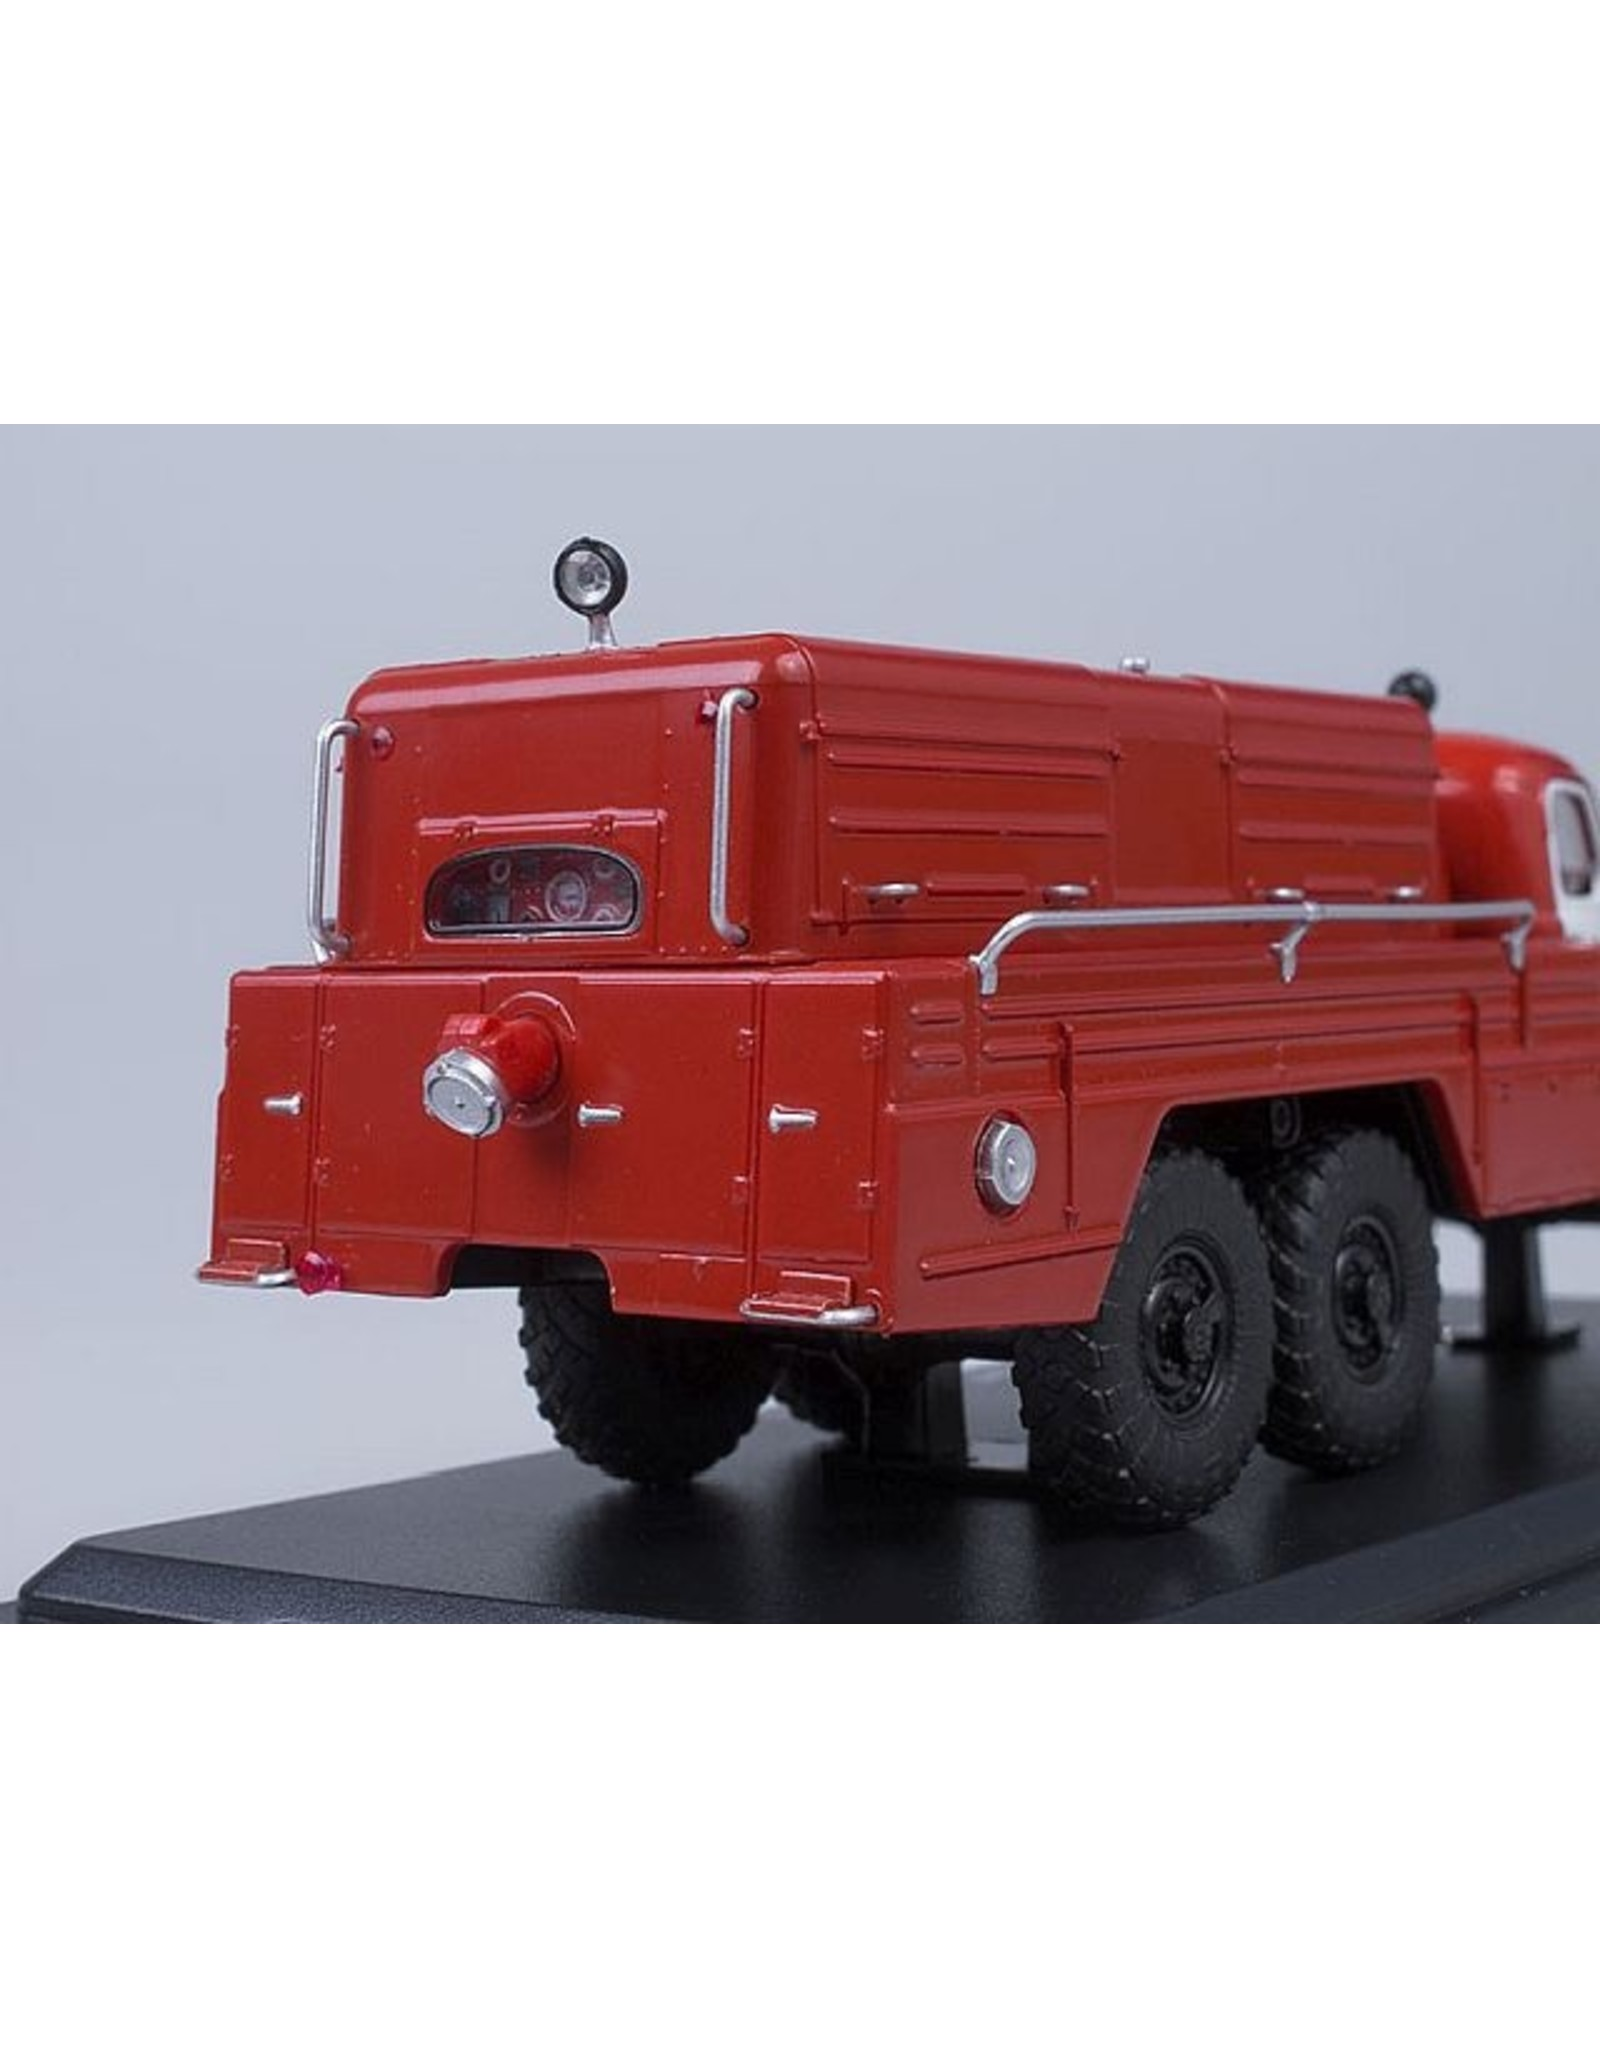 ZiL FIRE PUMP STATION PNS-100(157K)Urshel